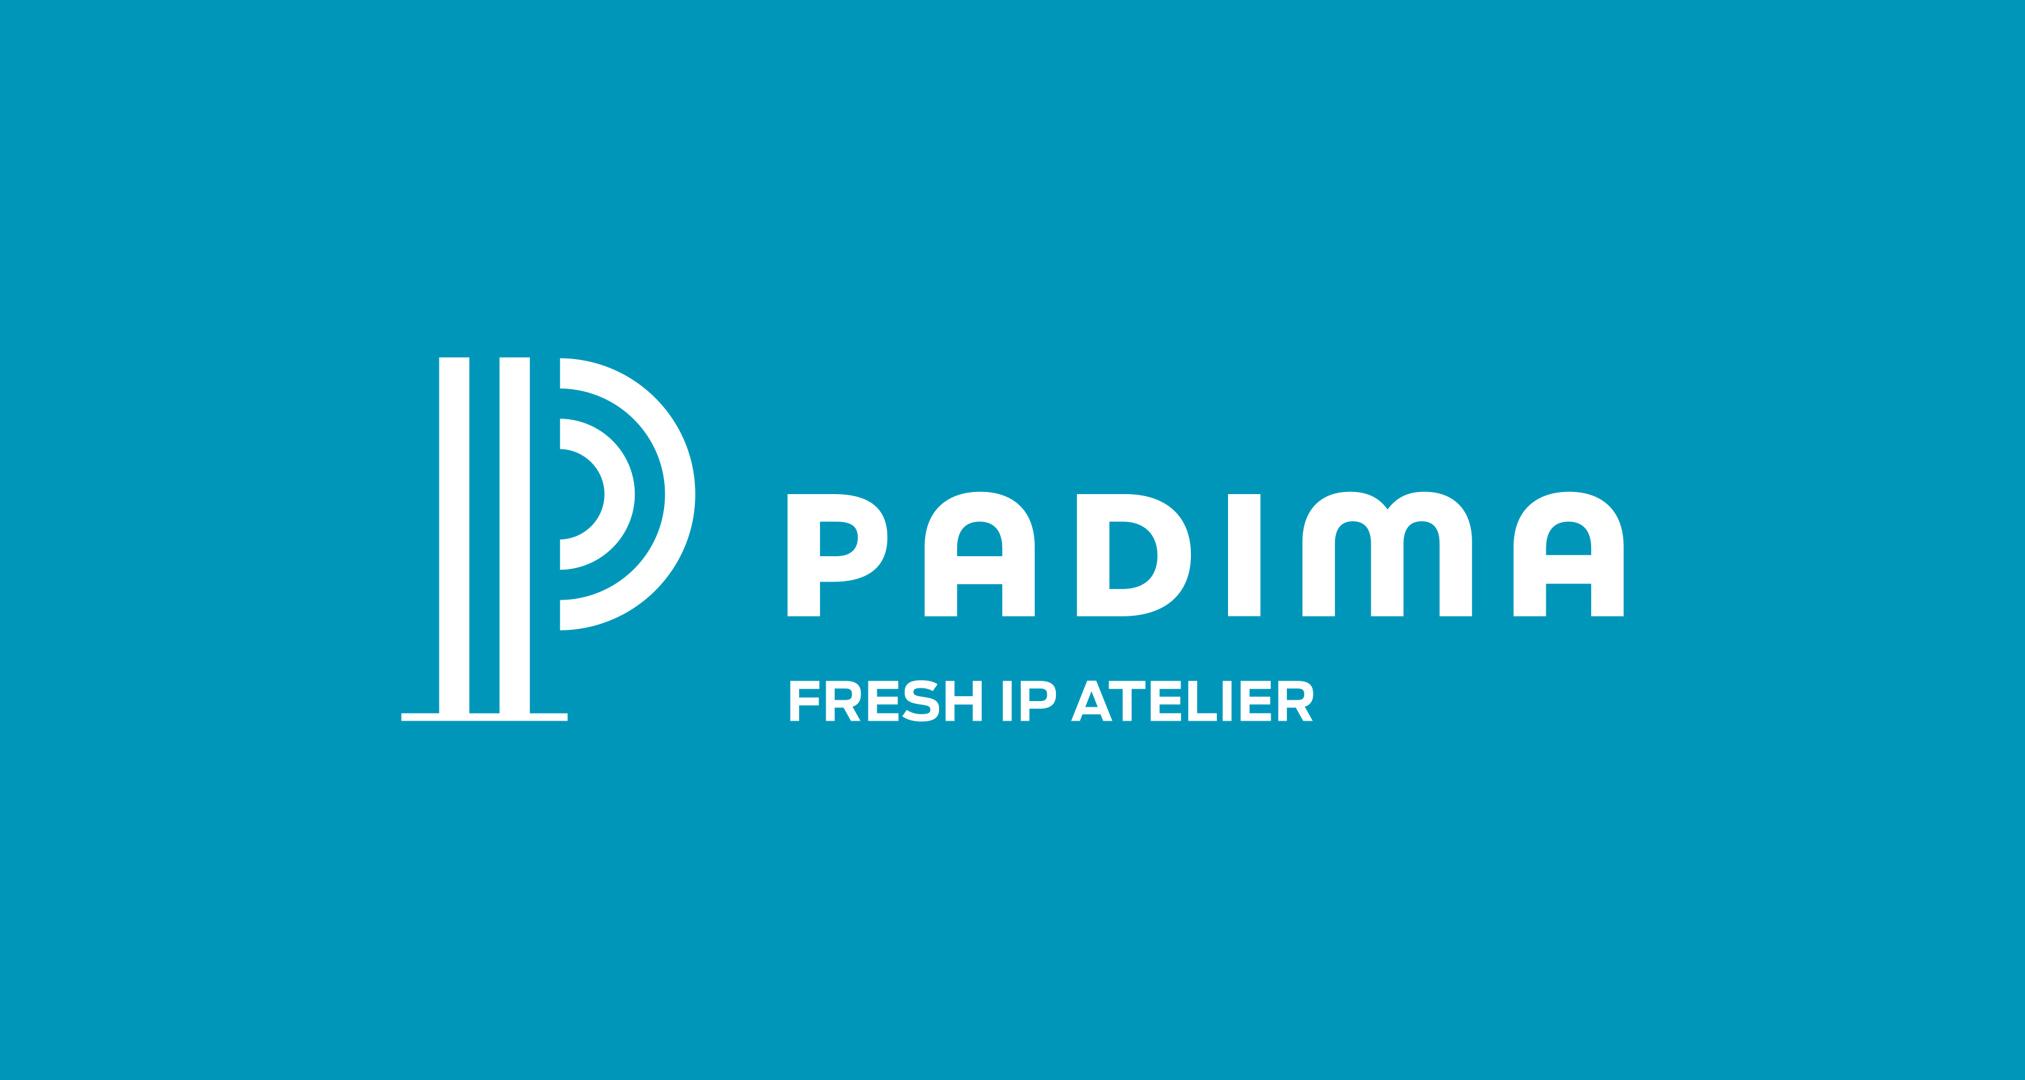 Podcast / Hablamos de branding e IP con Padima